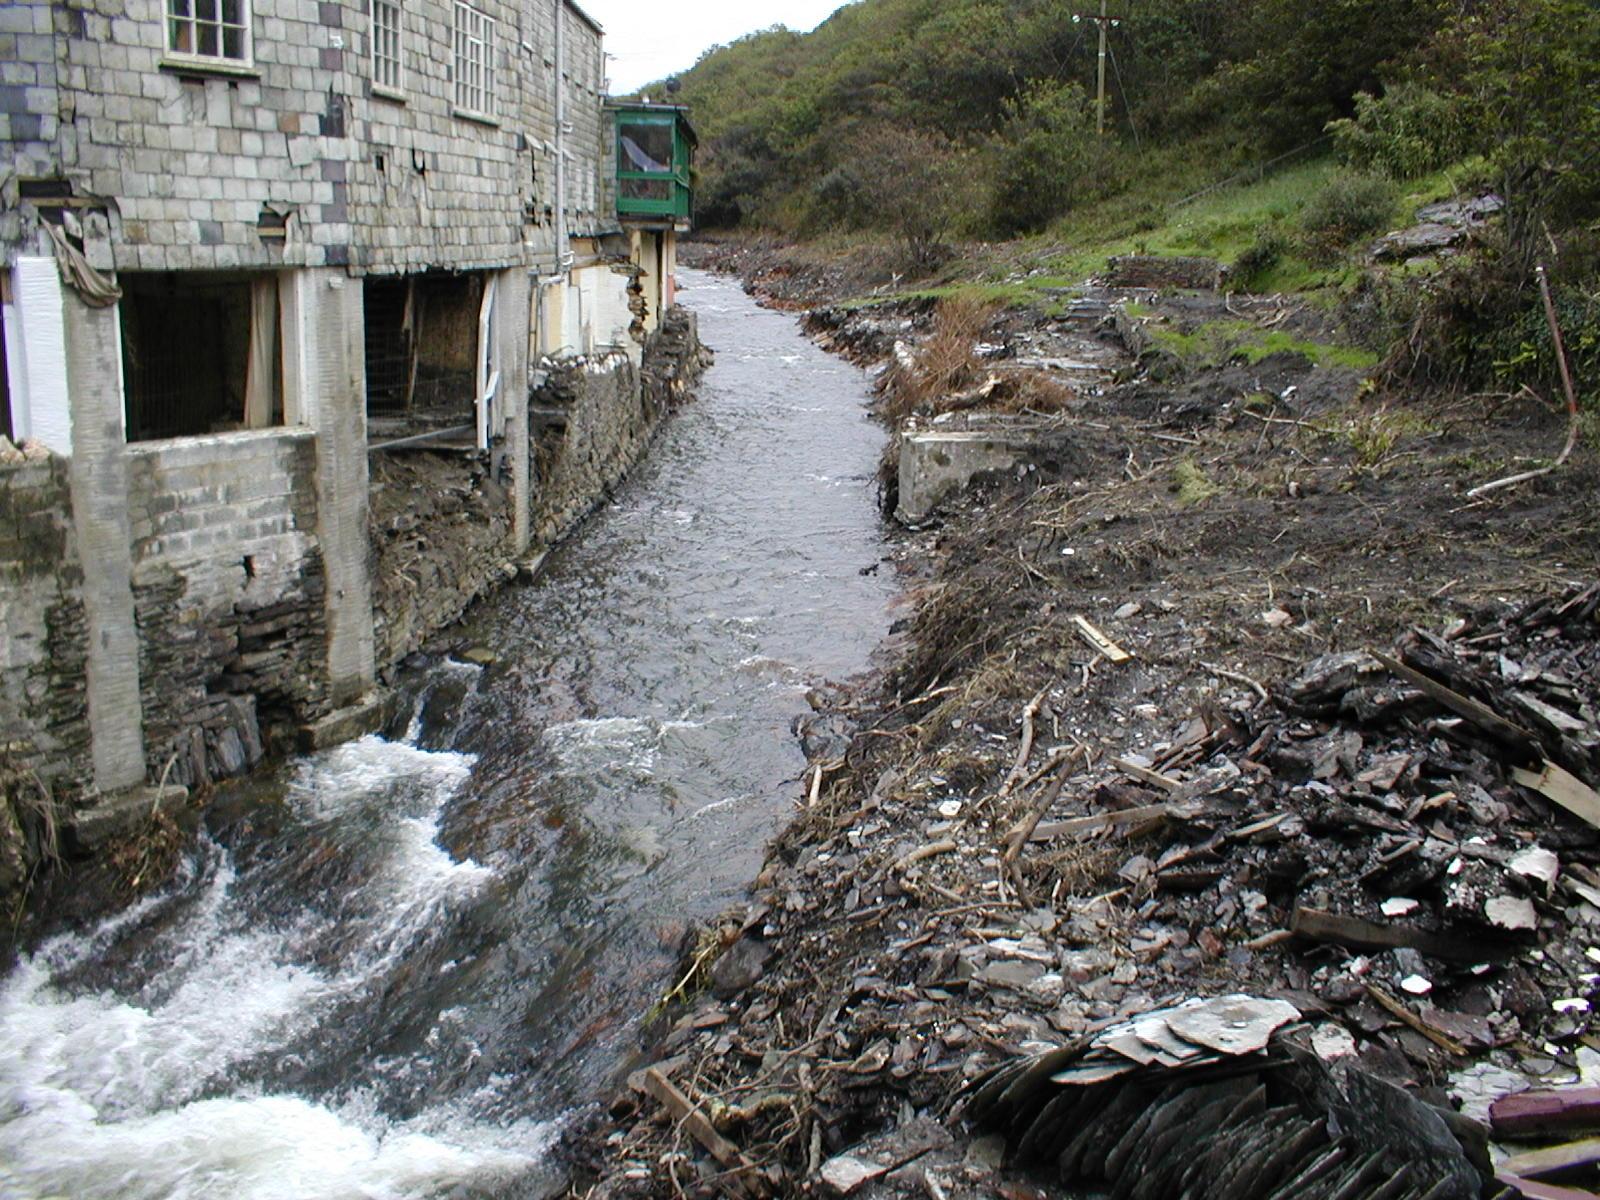 10 Facts about Boscastle Floods